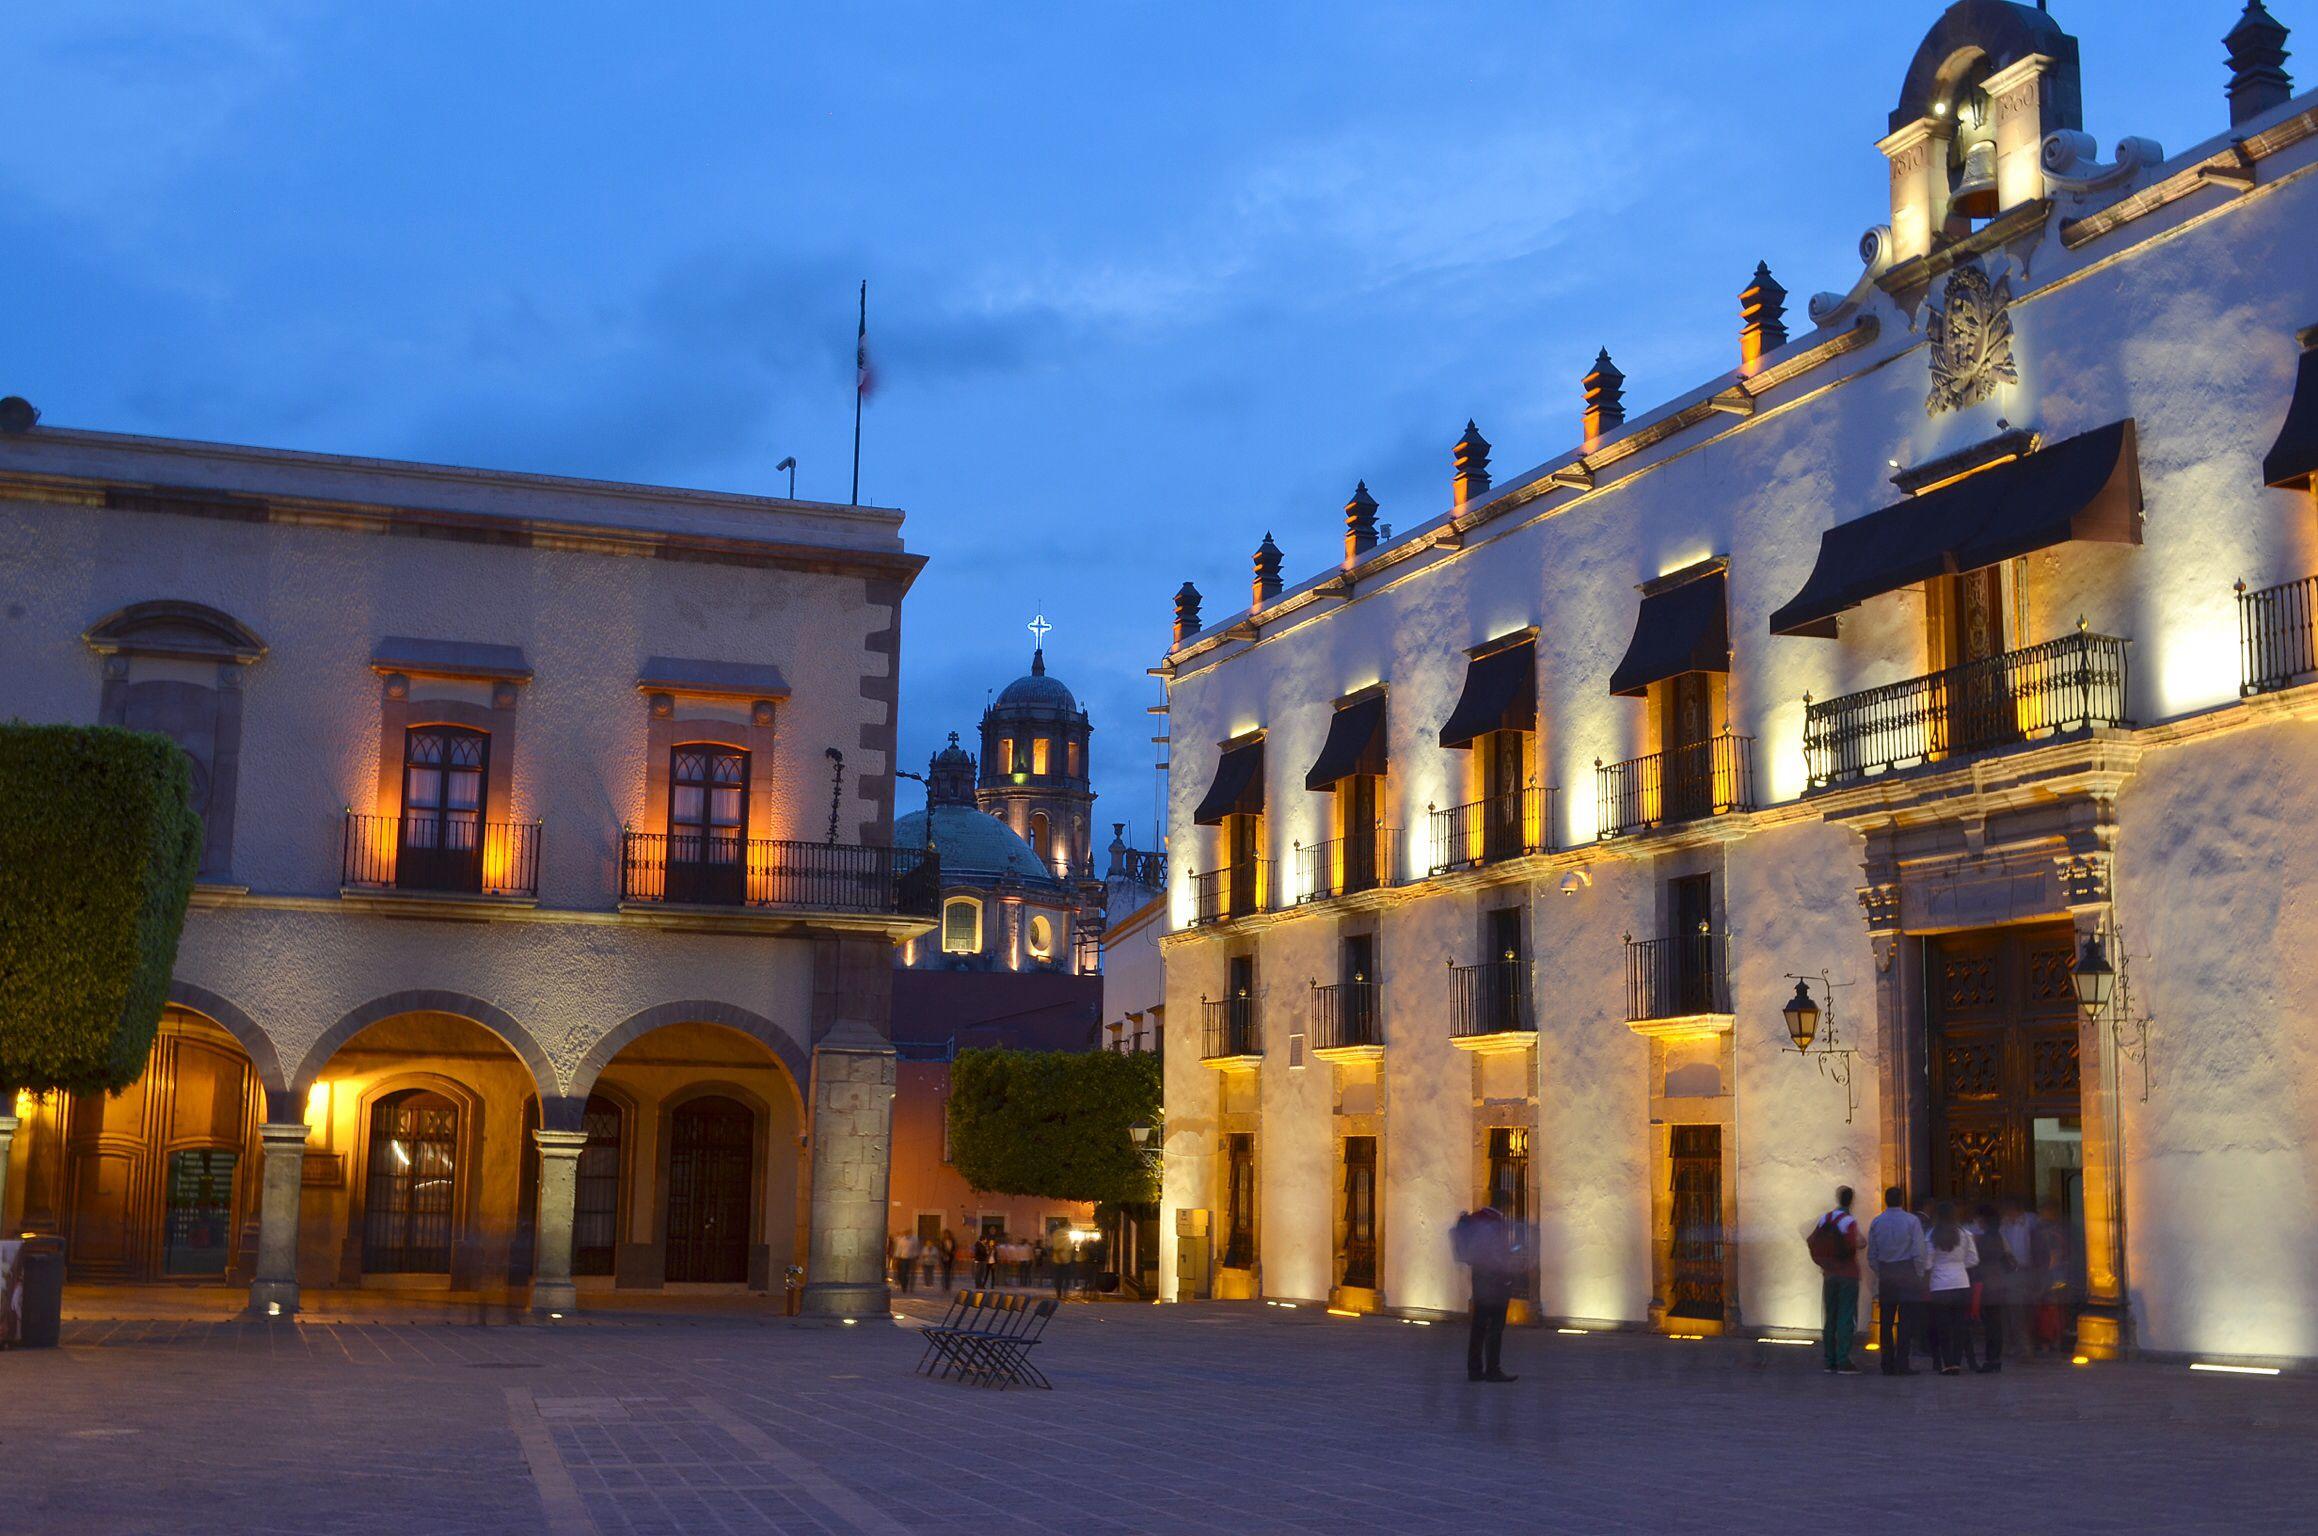 Querétaro - Plaza de Armas | Plaza de armas, Fotografia, Queretaro